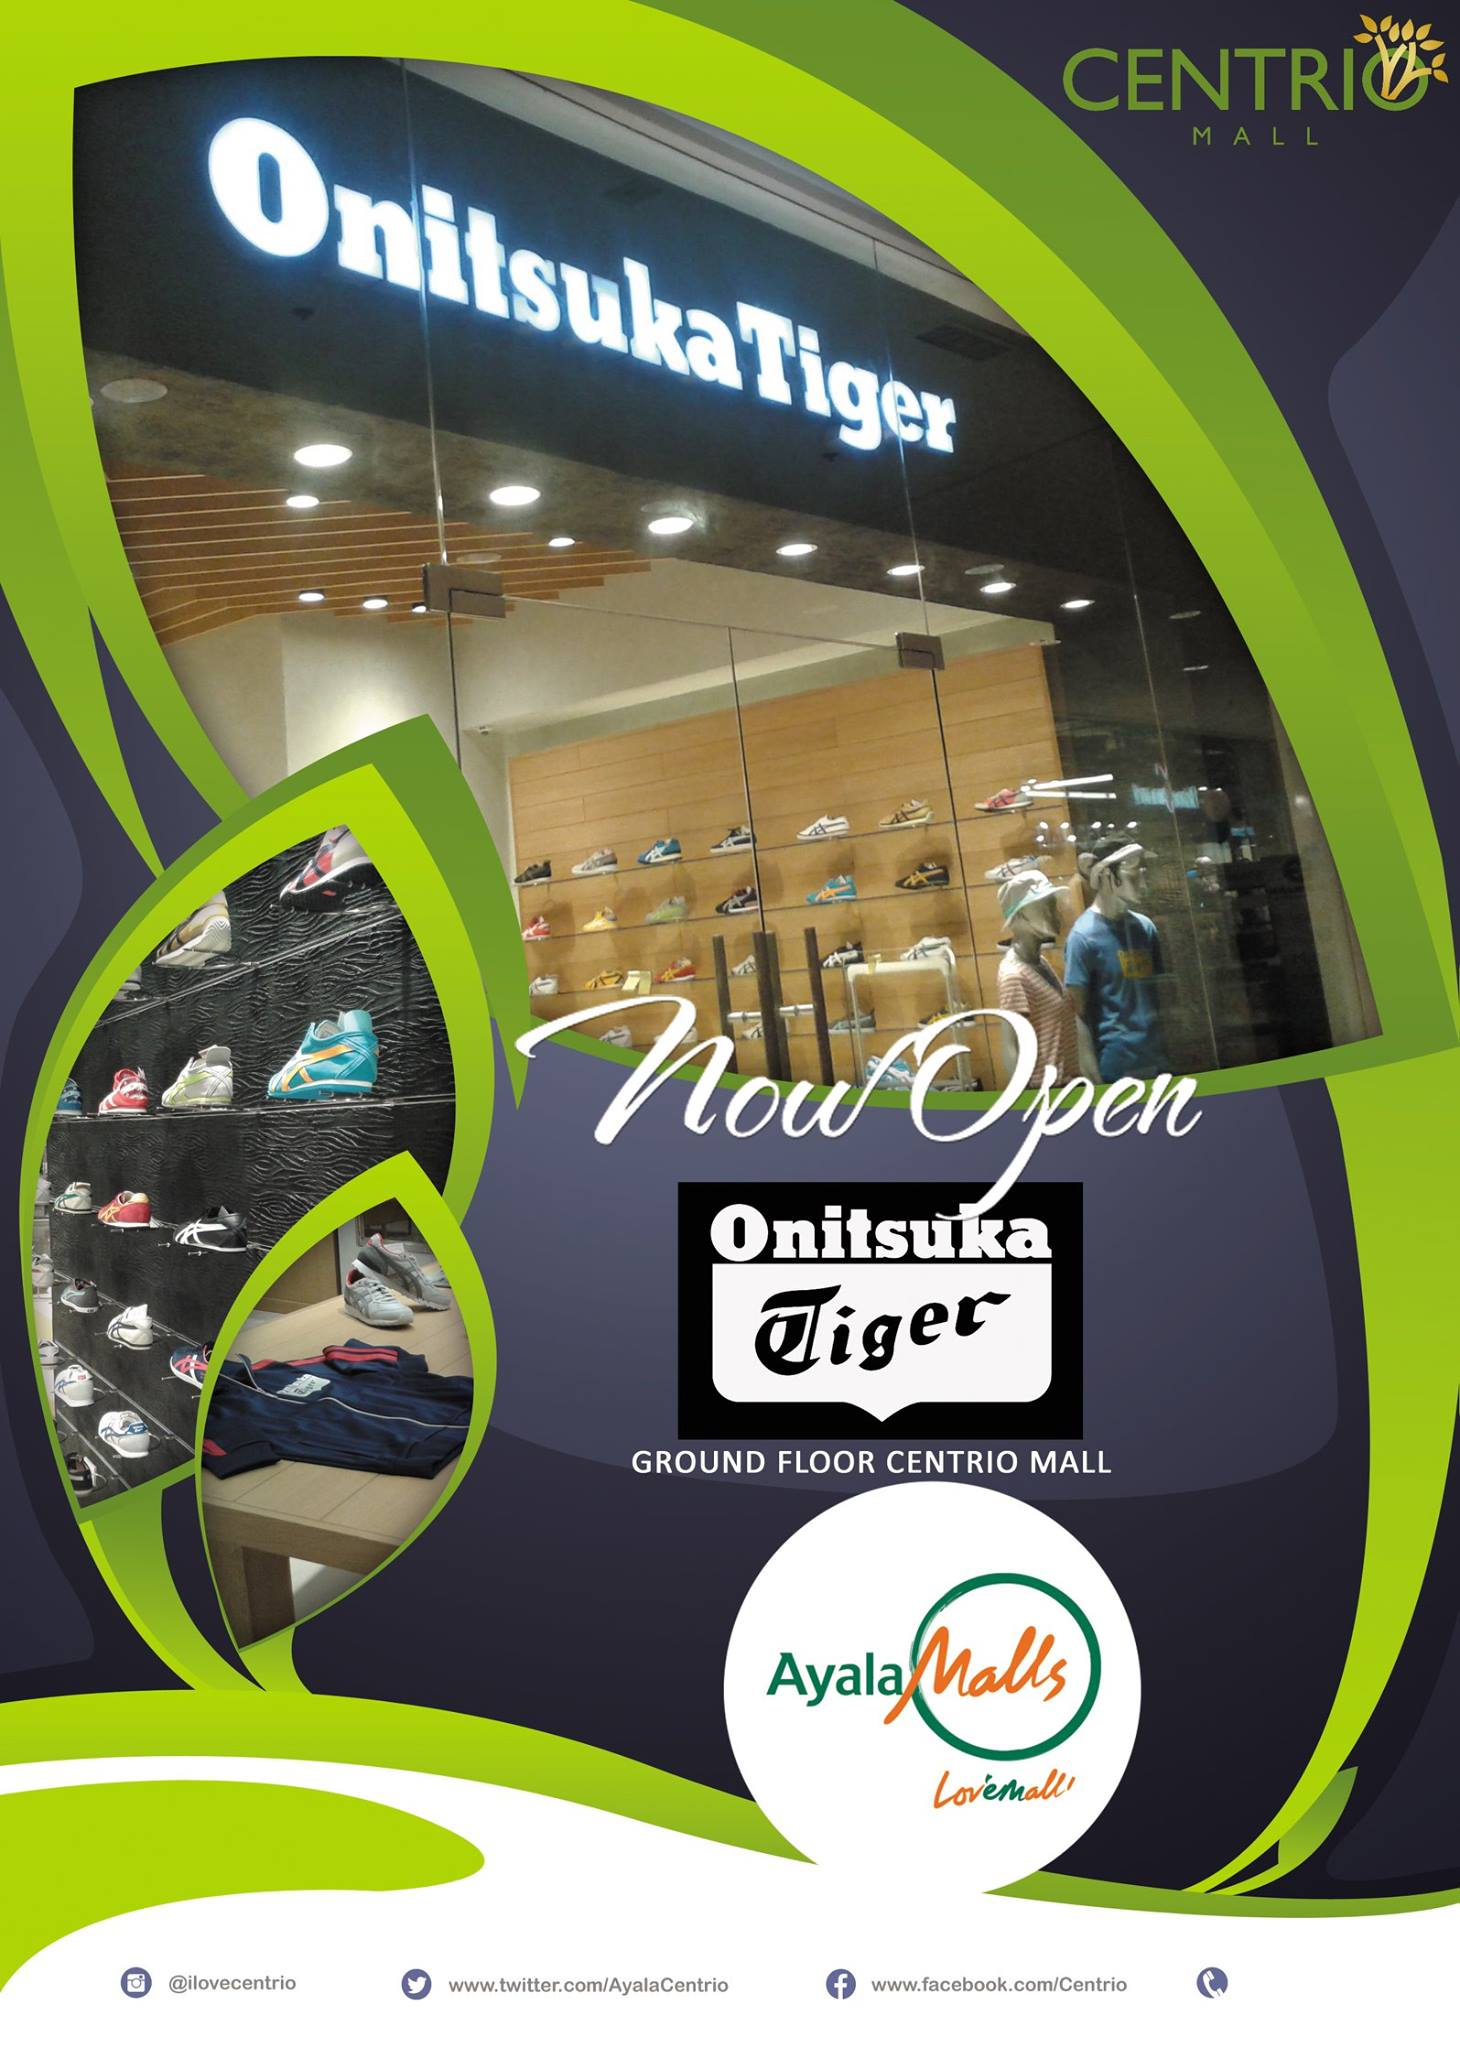 Onitsuka Tiger first store, Onitsuka Tiger, Onitsuka Tiger Cagayan de Oro, Japanese lifestyle brand Cagayan de Oro, Centrio Mall, cdo dev, Cagayan de Oro development